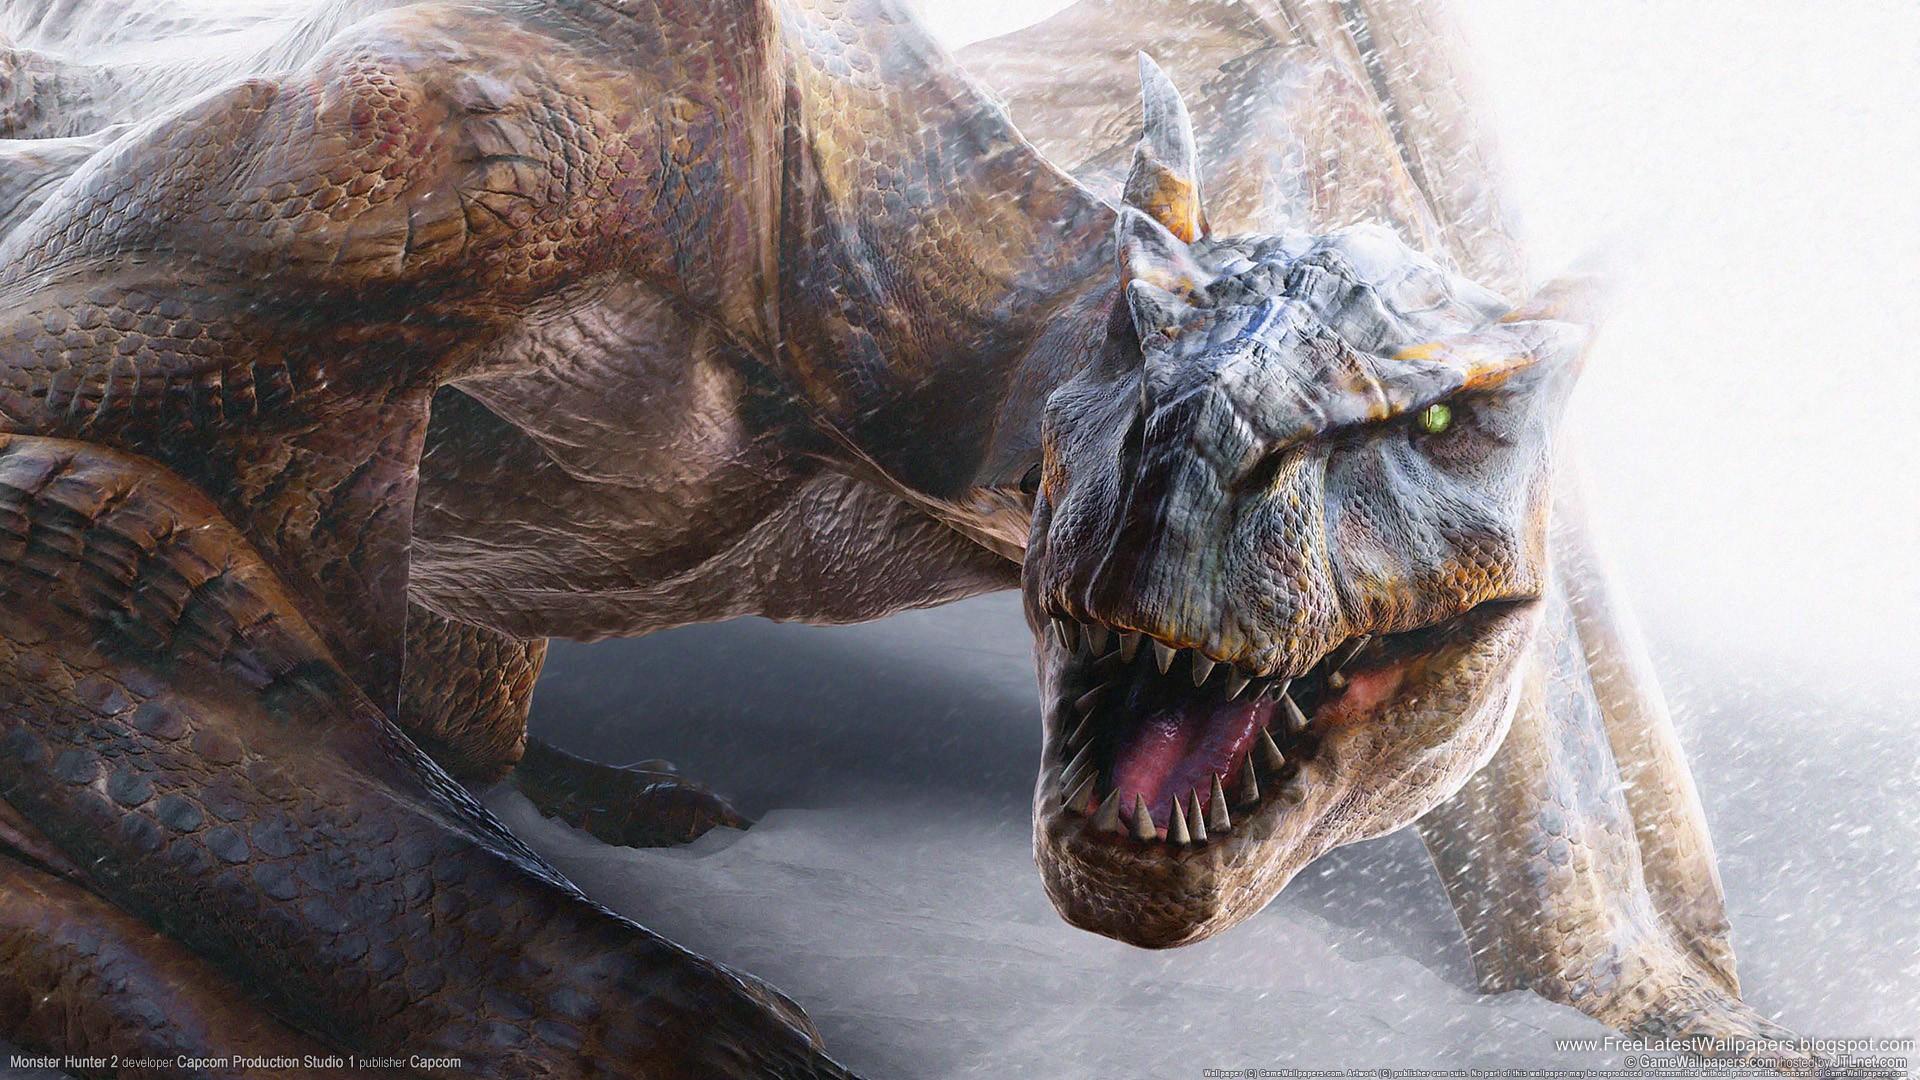 Dinosaur Part Dinosaurs Wallpaper 1920x1080 Full HD Wallpapers 1920x1080